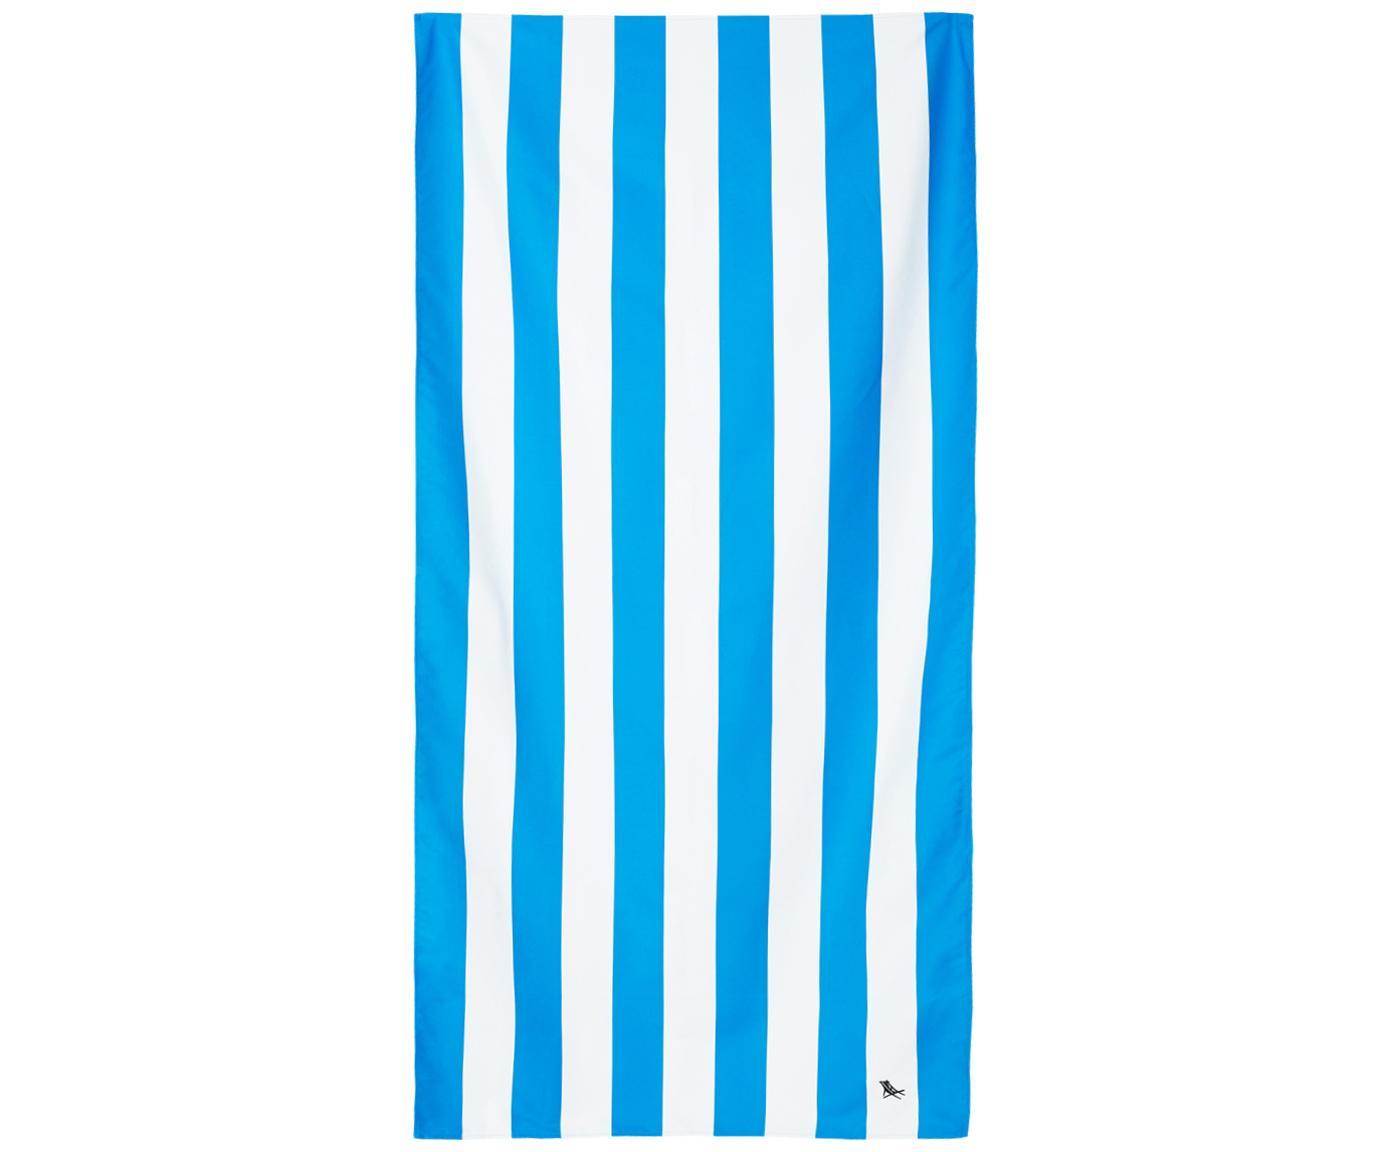 Microvezel strandlaken Cabana, schnell trocknend, Microvezels (80% polyester, 20% polyamide), Blauw, wit, 90 x 200 cm